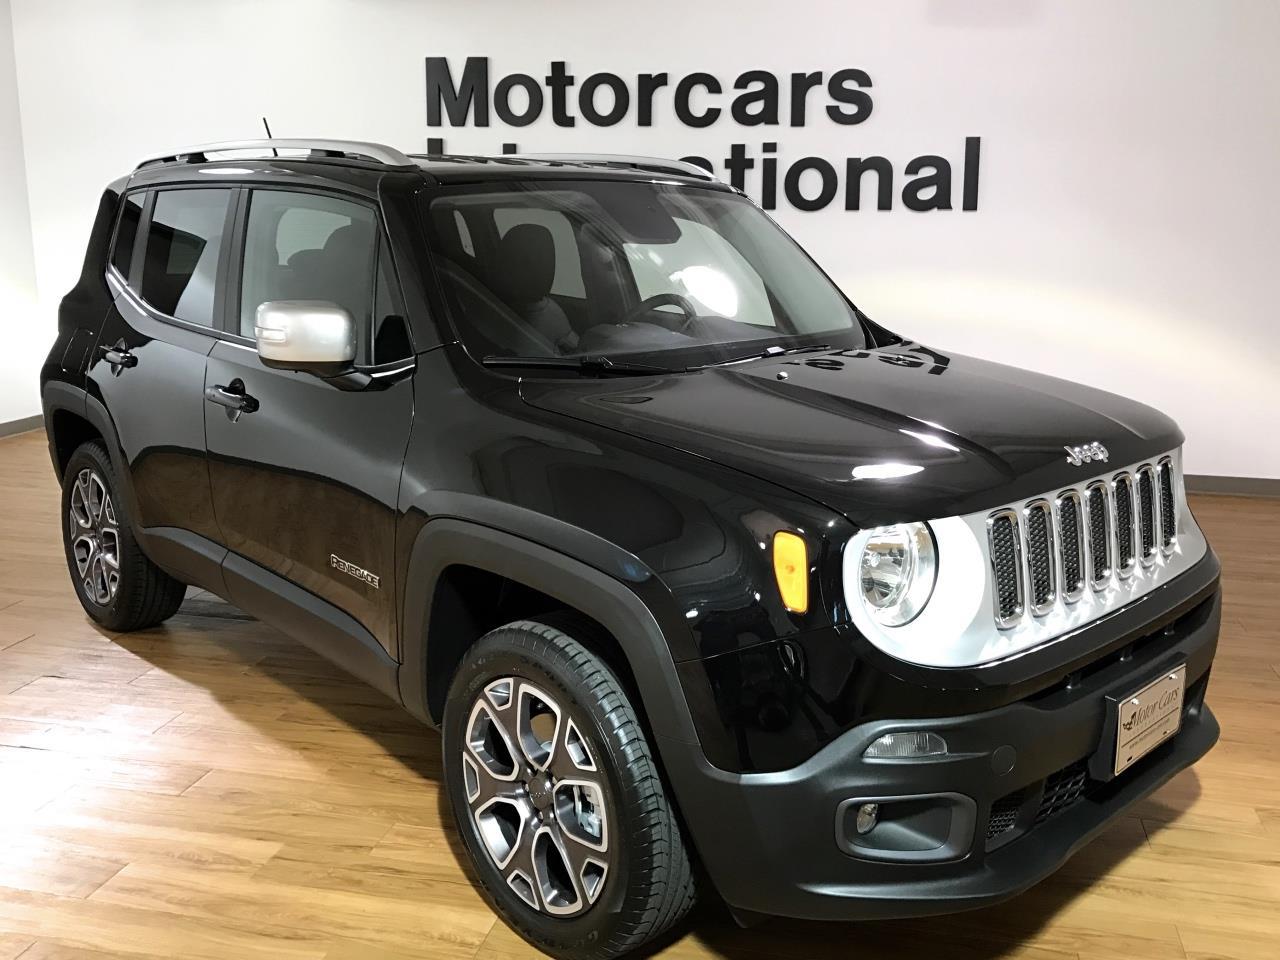 2017 jeep renegade limited 4x4. Black Bedroom Furniture Sets. Home Design Ideas